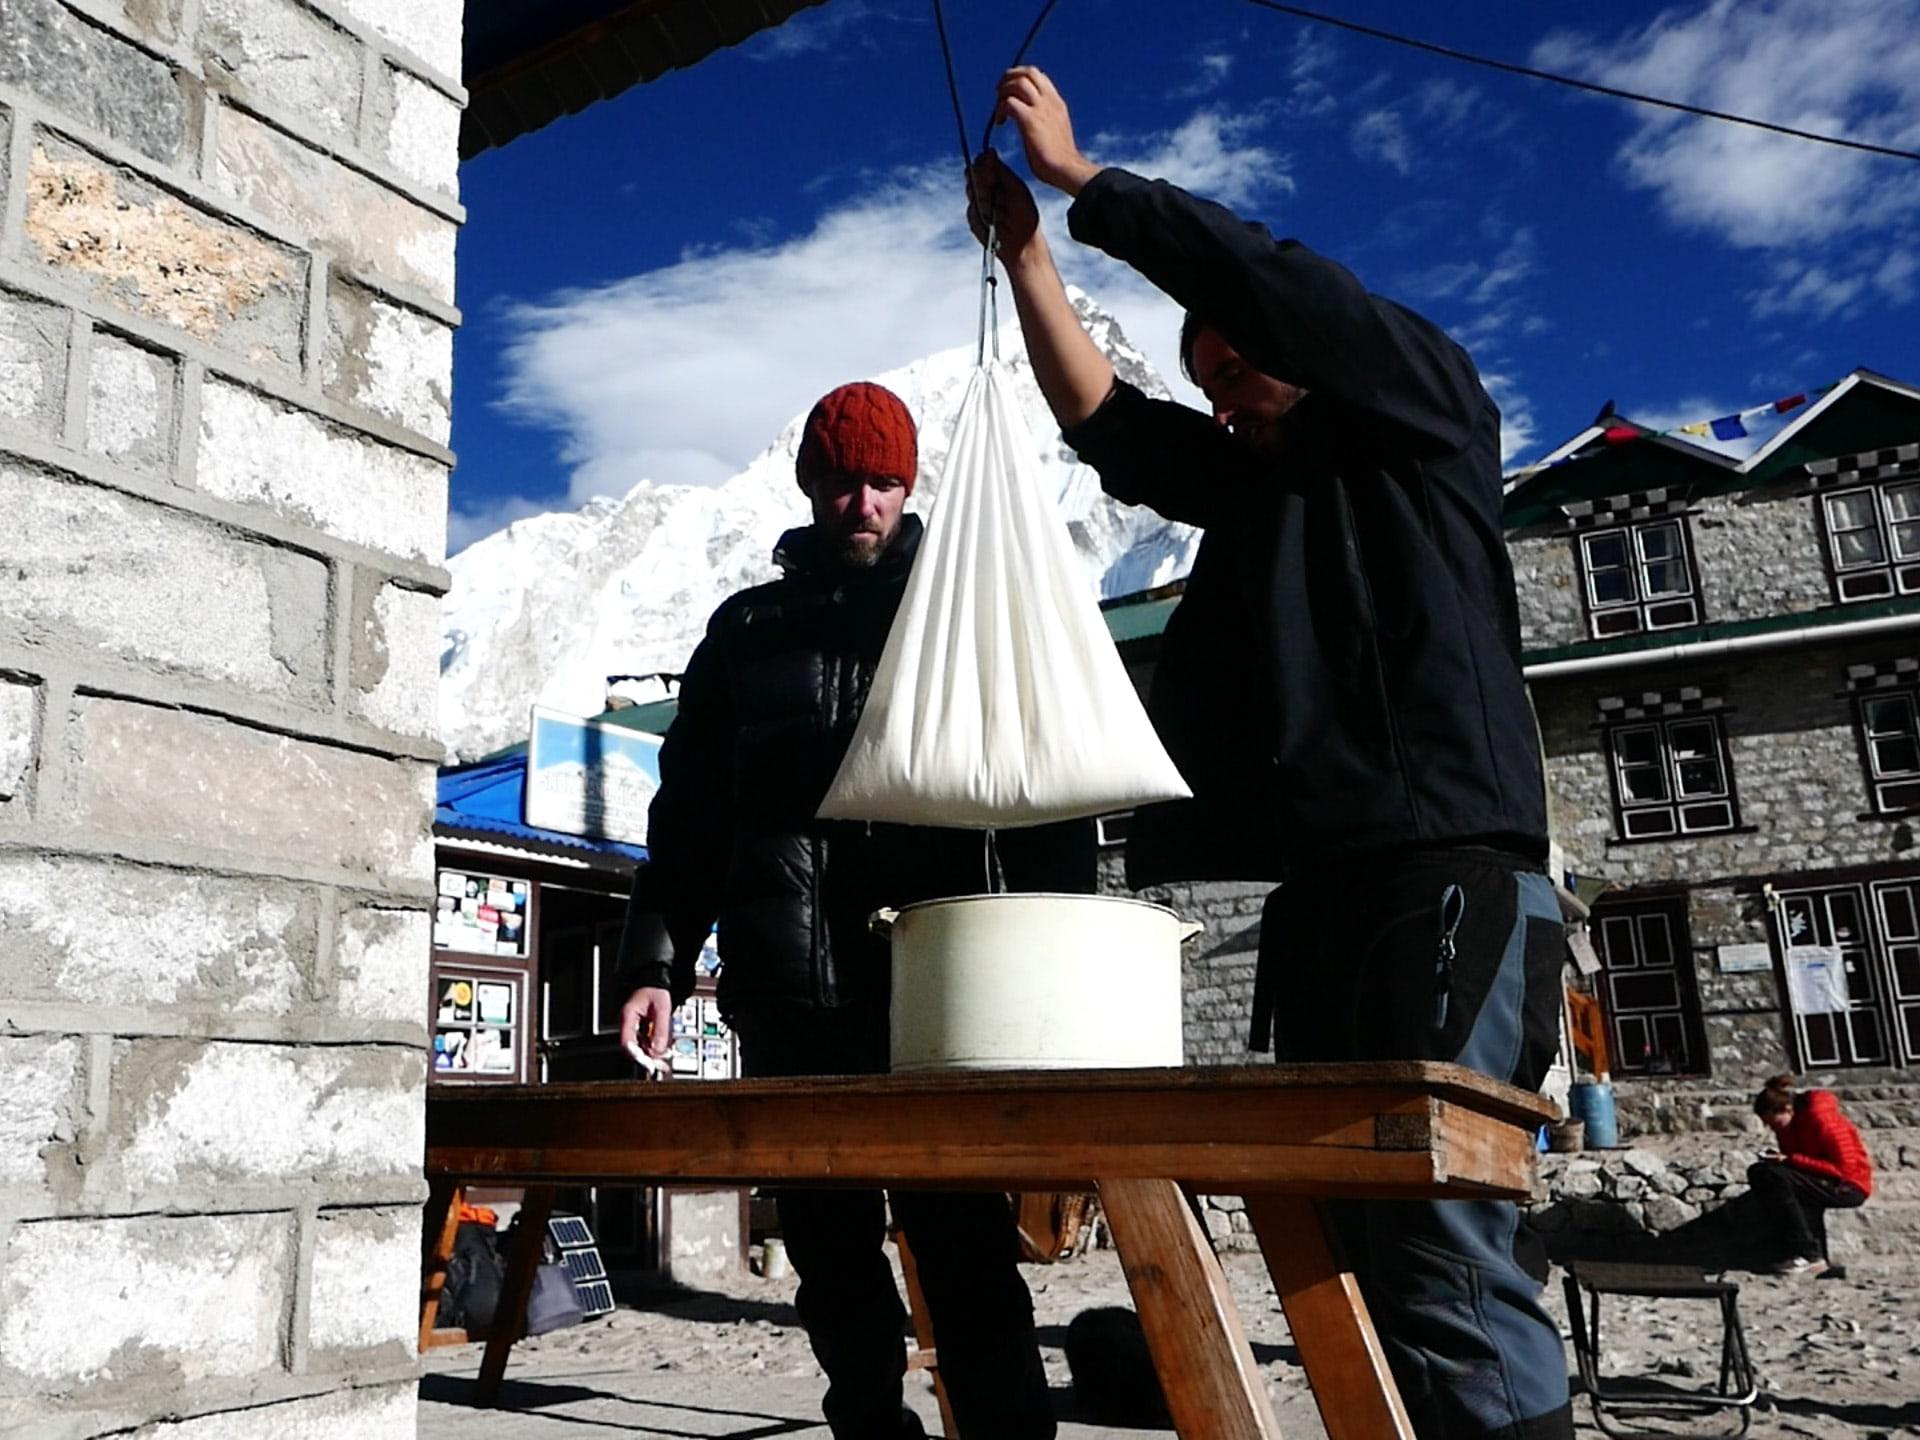 James and Kevin making yogurt on Everest.